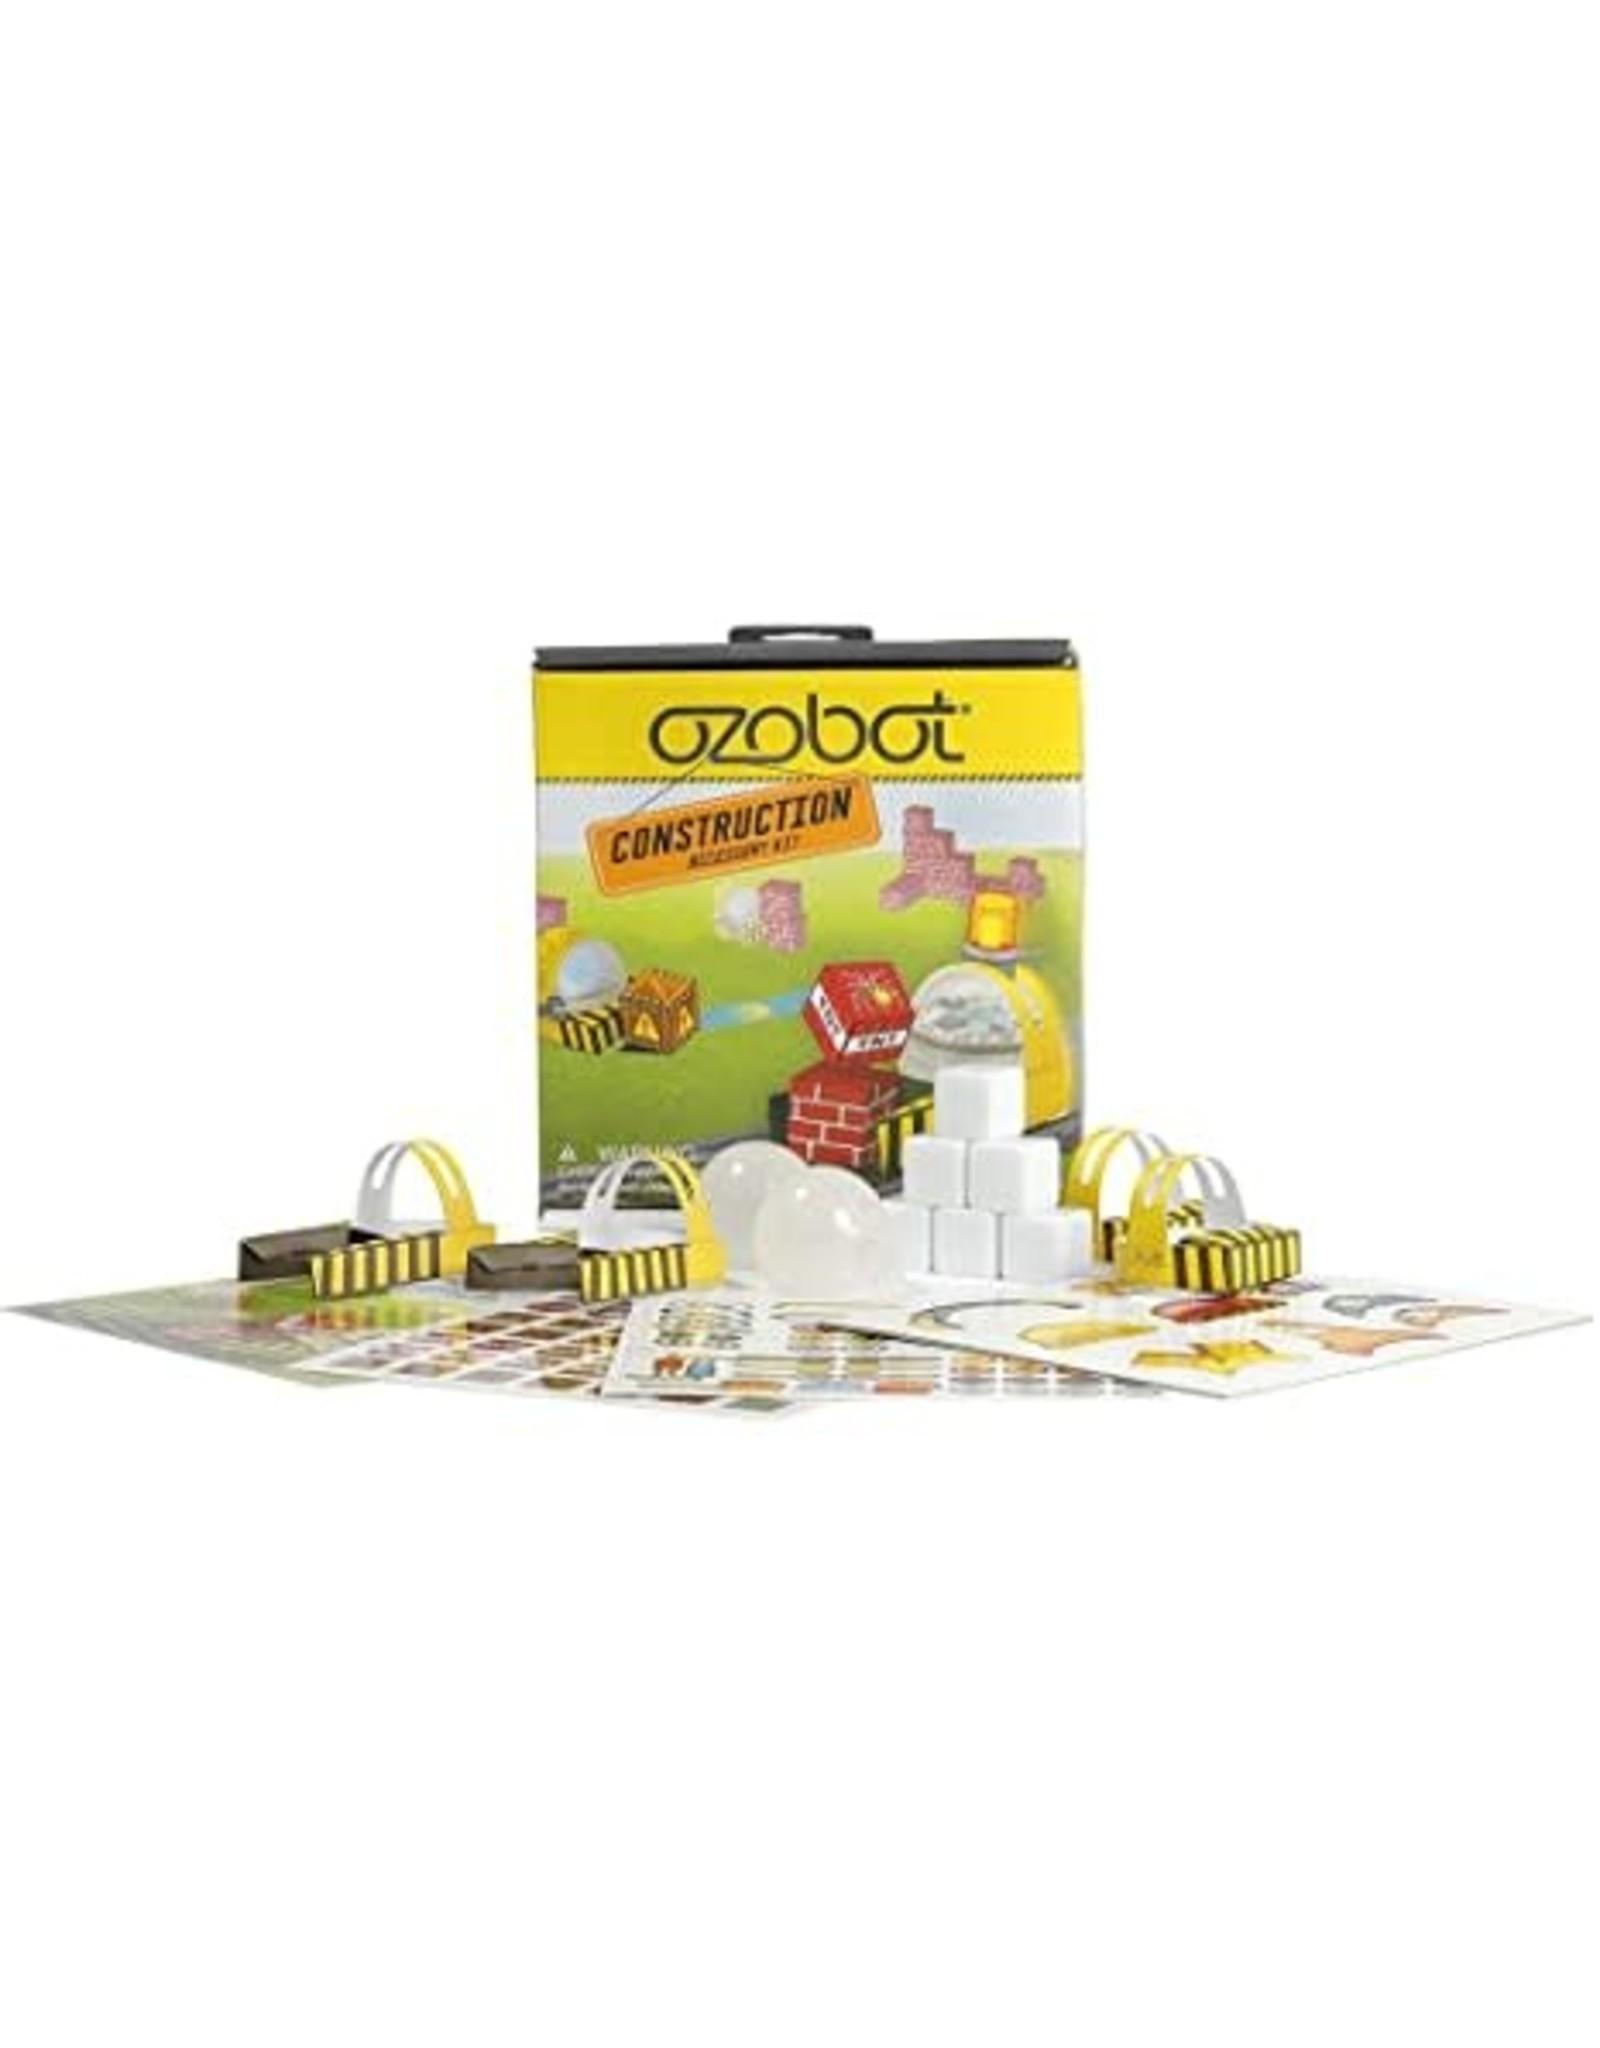 Ozobot Ozobot Construction Accessory Kit